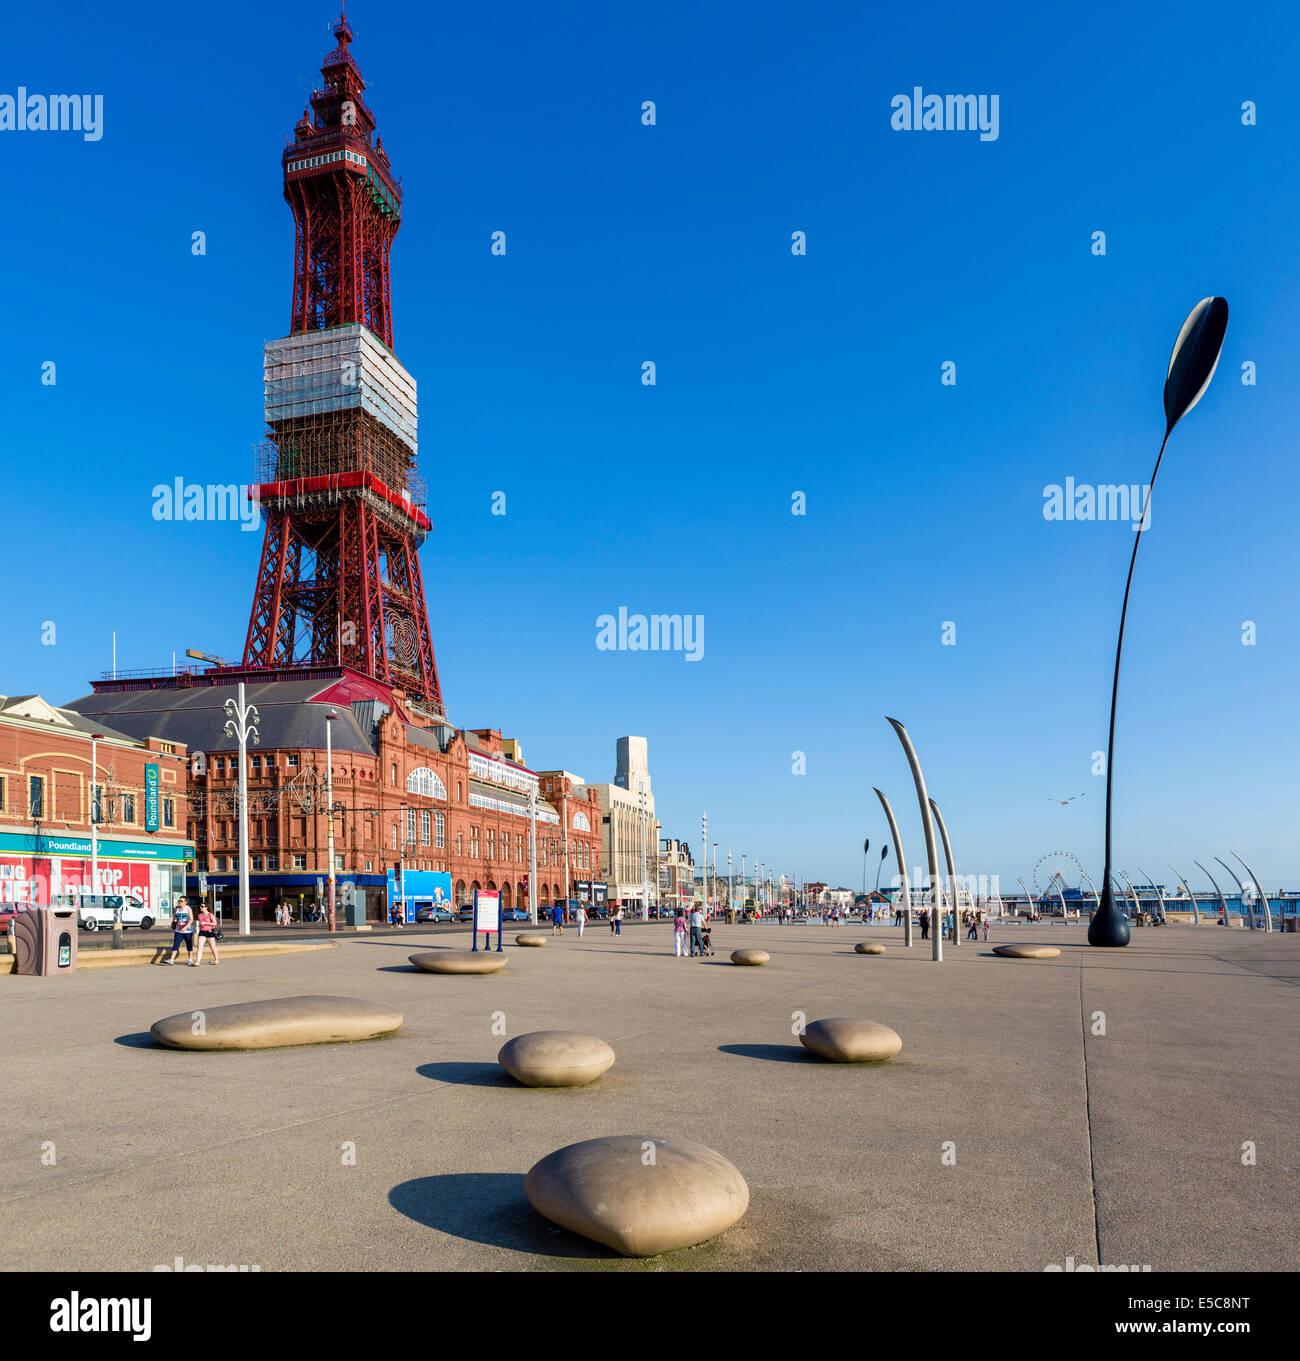 The seafront promenade outside Blackpool Tower, The Golden Mile, Blackpool, Lancashire, UK - Stock Image